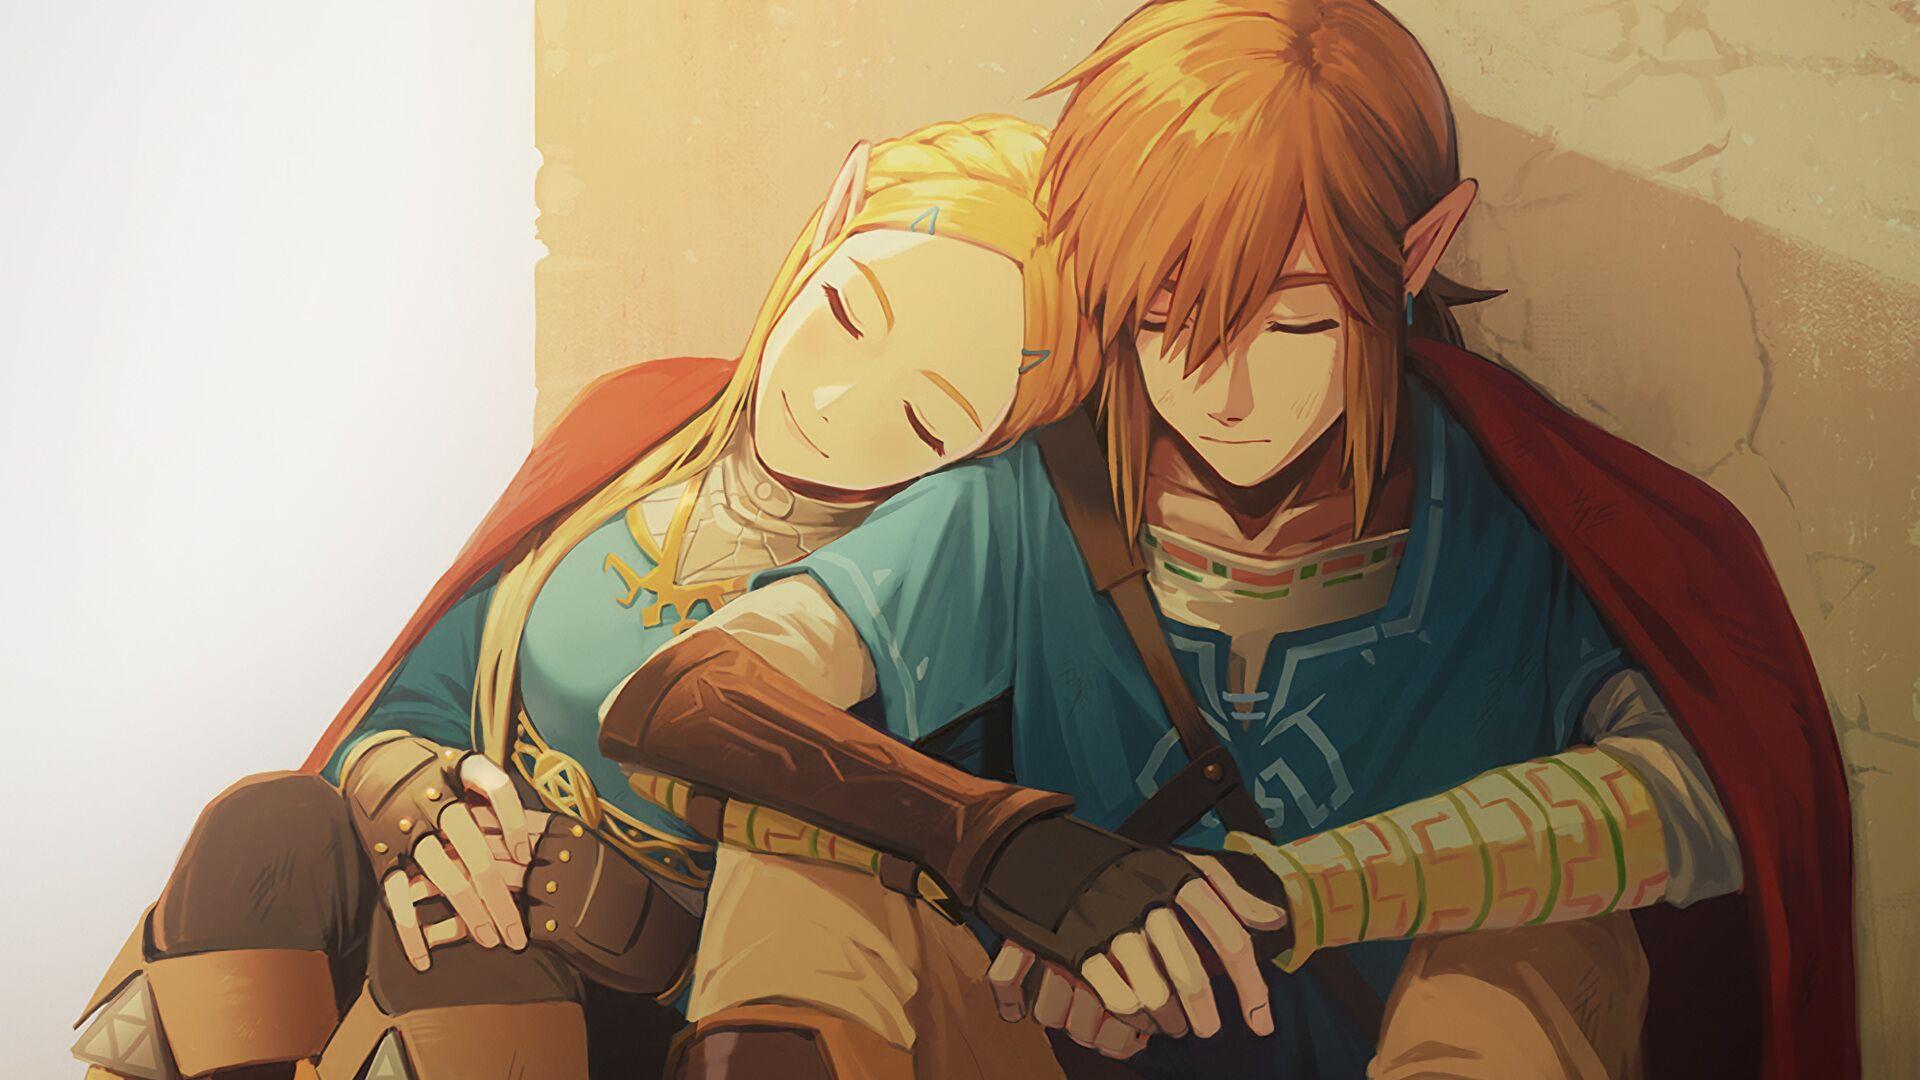 General 1920x1080 The Legend of Zelda: Breath of the Wild Princess Zelda Link video games artwork The Legend of Zelda closed eyes sleeping